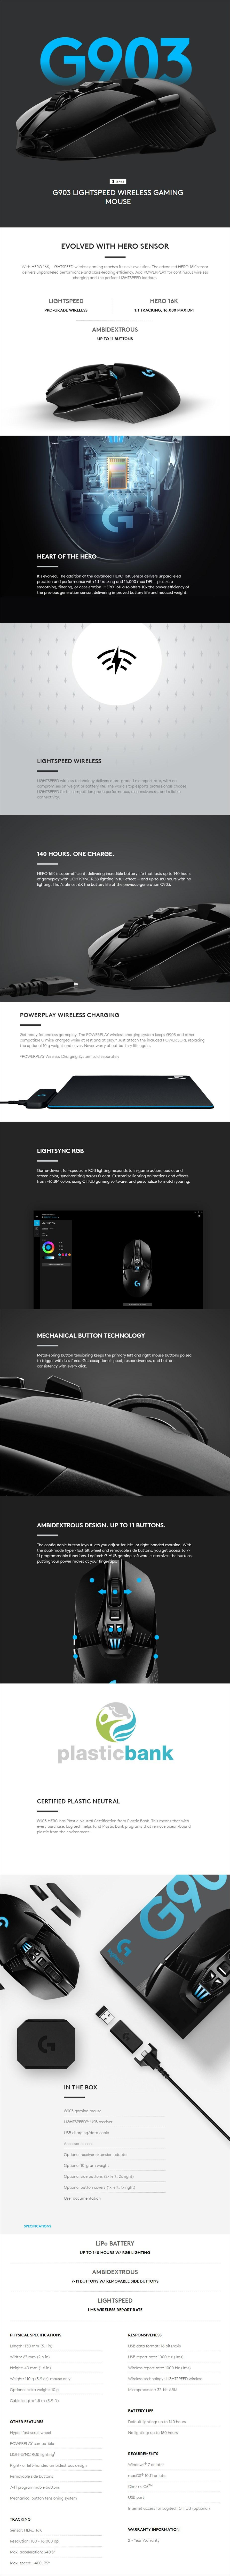 Logitech G903 HERO LIGHTSPEED Wireless Gaming Mouse - Overview 1